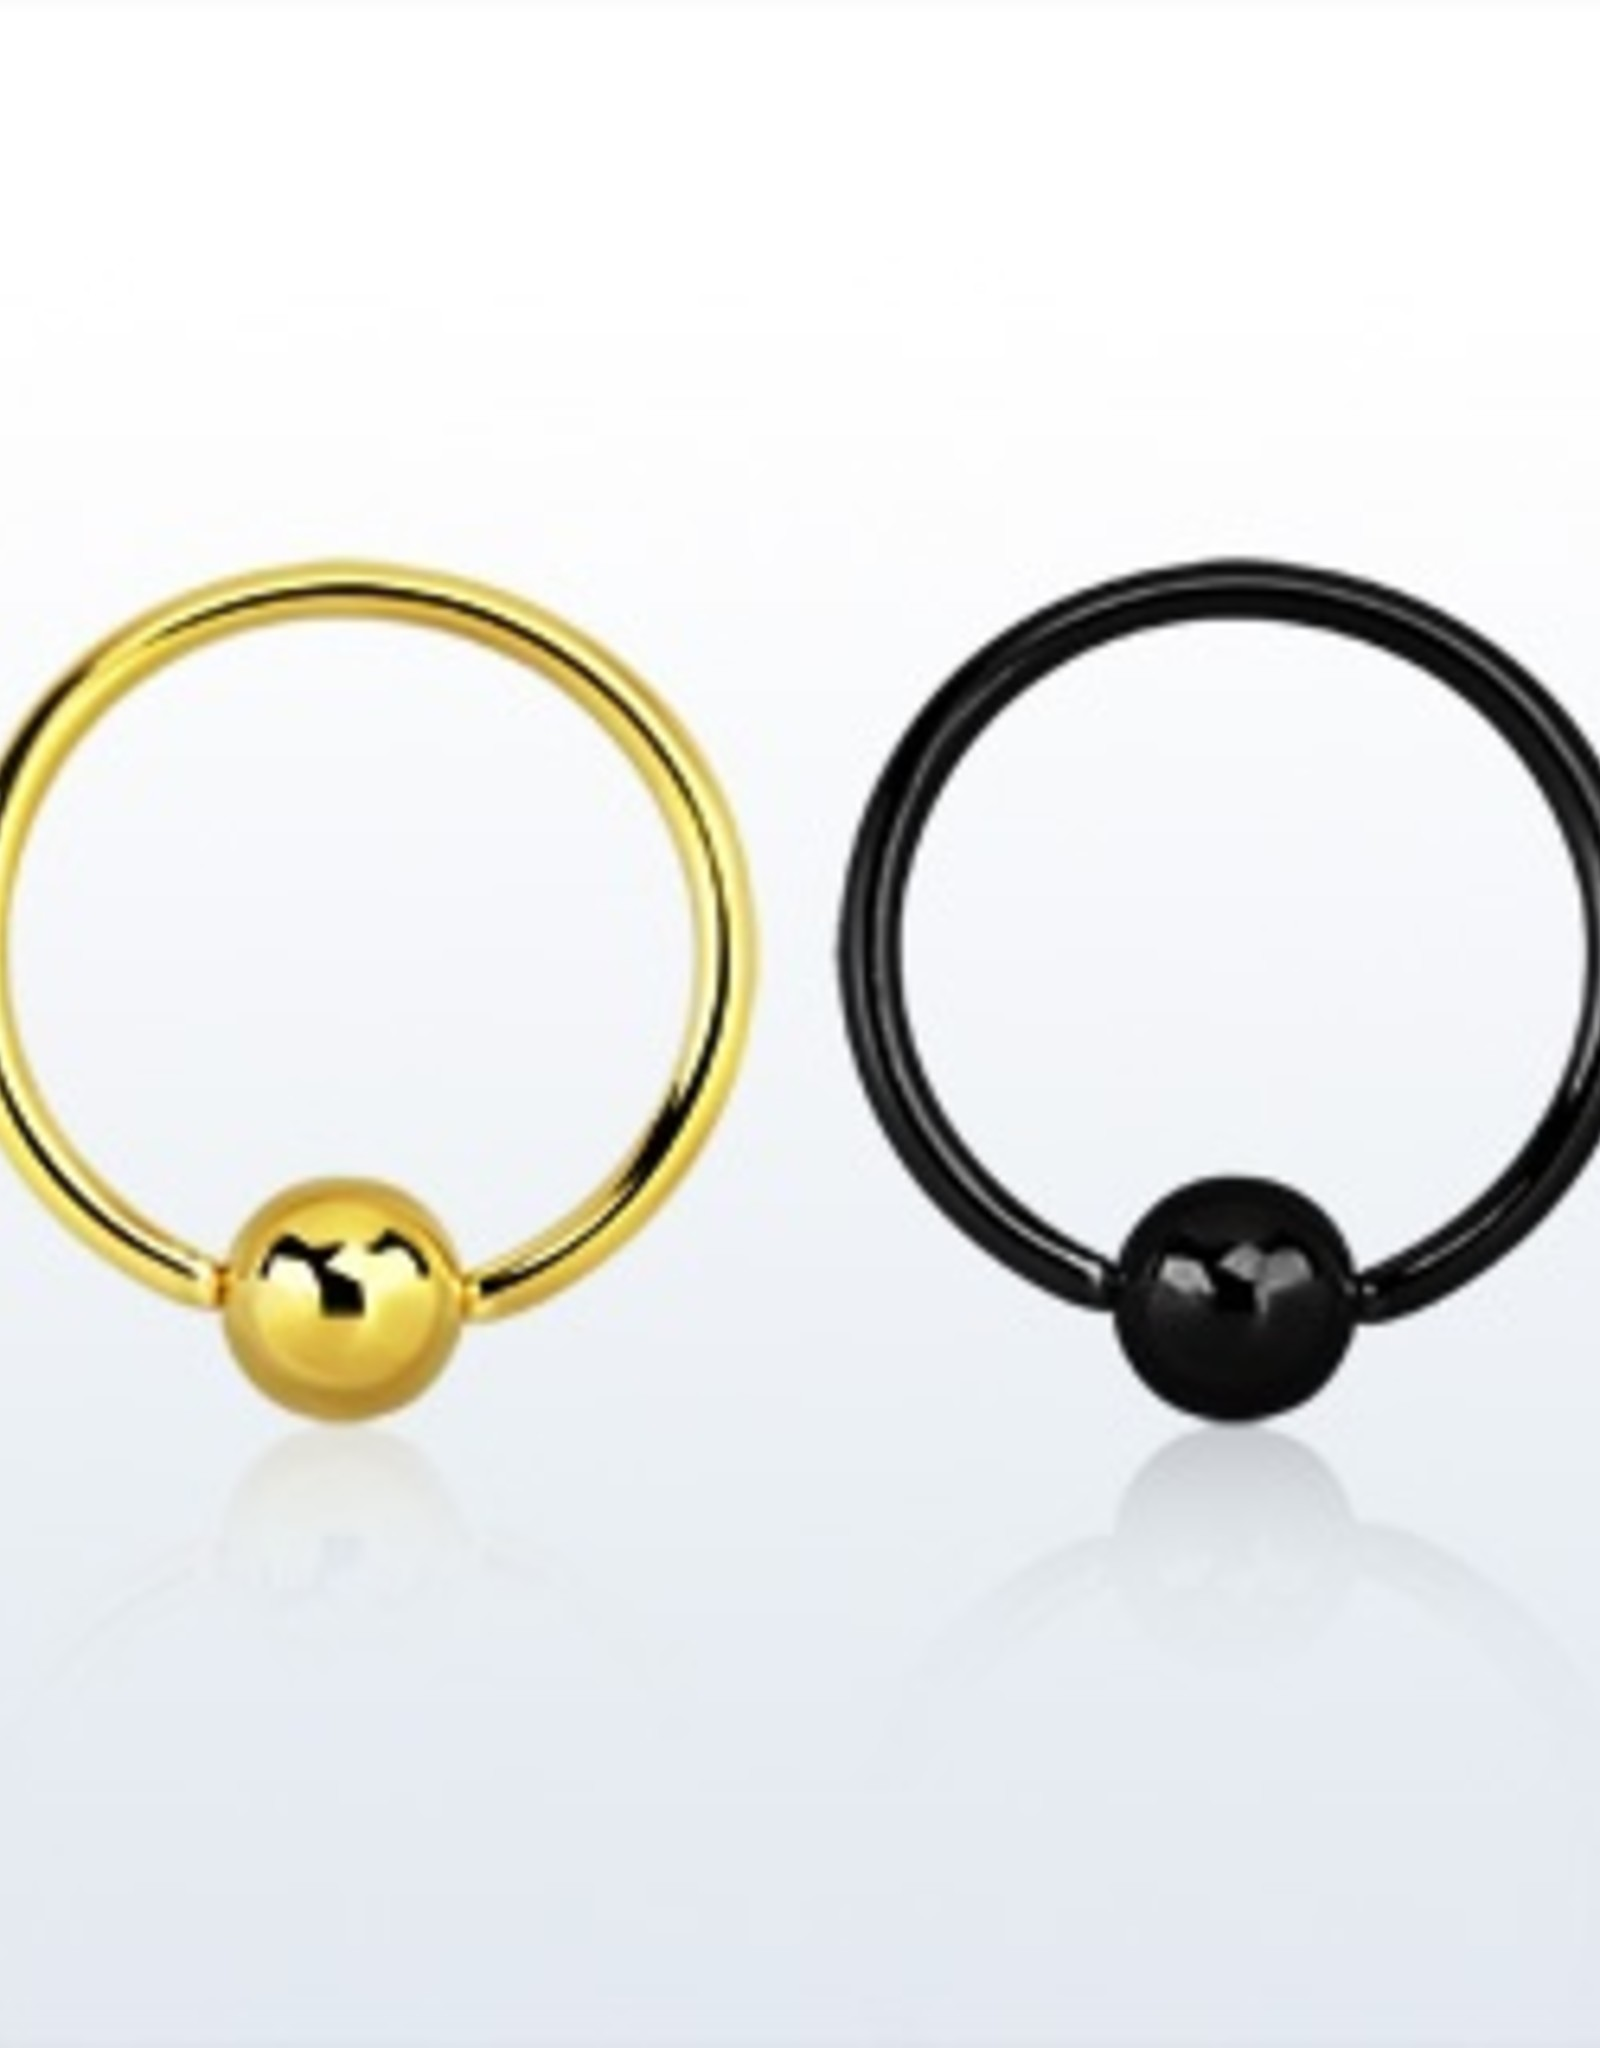 Anodized ball closure ring - 20g (eyebrow), 3mm ball-10MM-Black